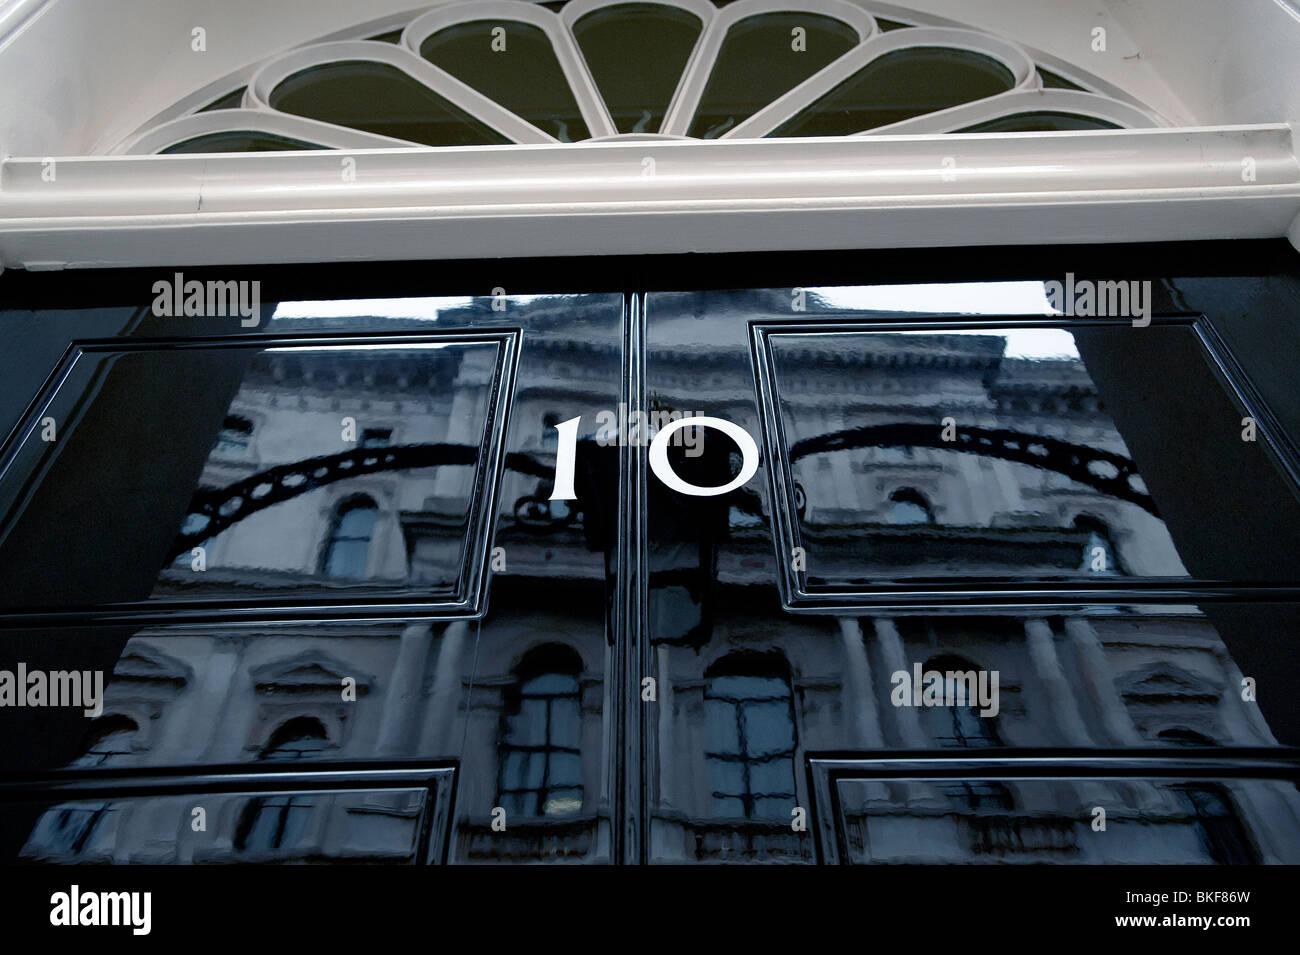 Number 10 Downing street front door - Stock Image